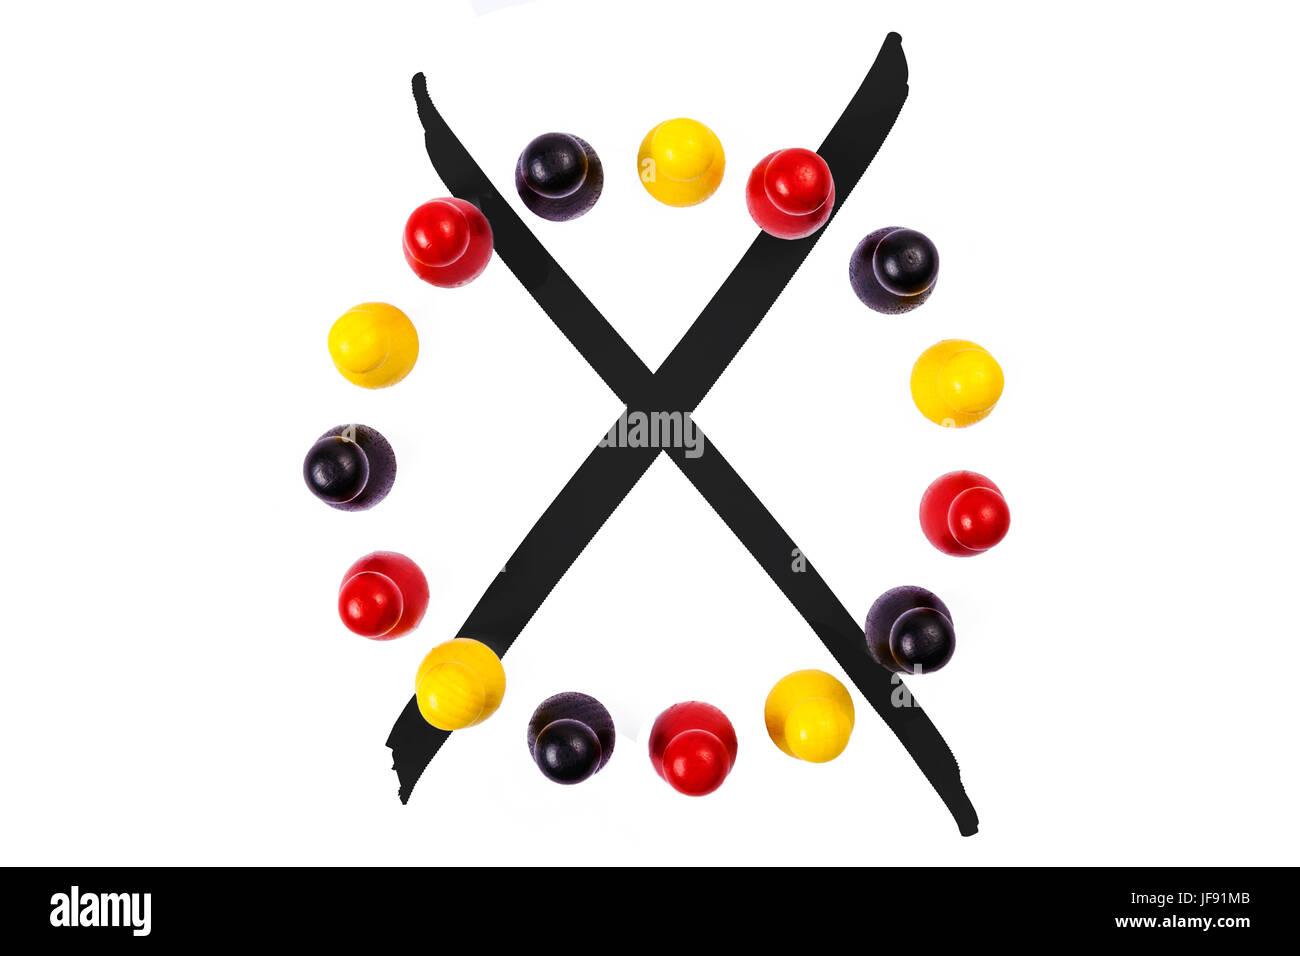 Figures and optional cross (german flag) - Stock Image